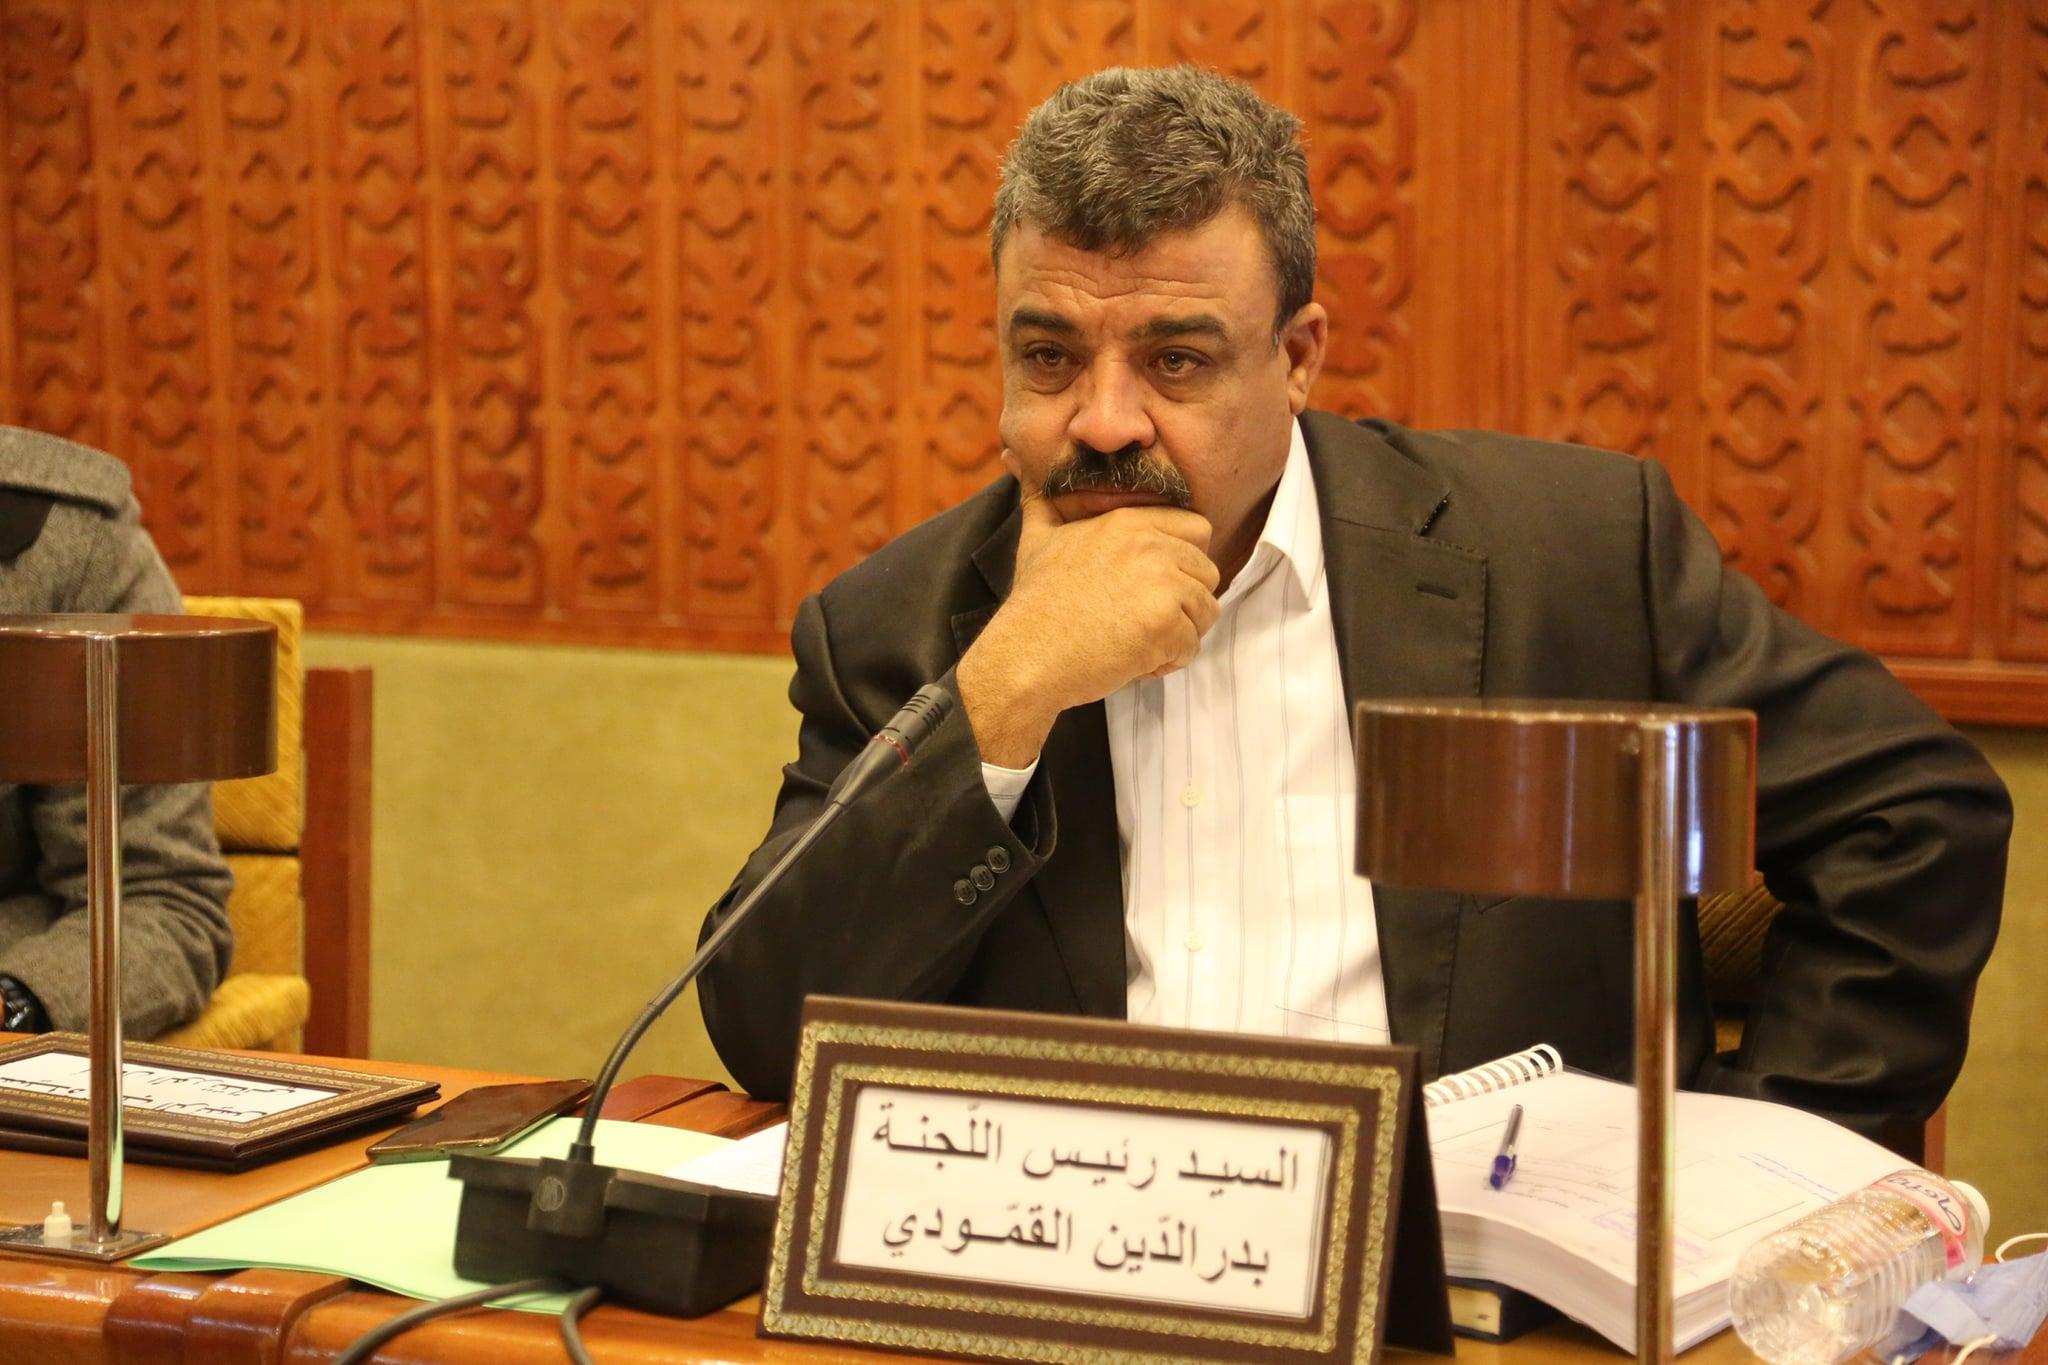 Dernière minute- Tentative d'assassinat contre les députés Badreddine Gammoudi et Ali Ben Aoun